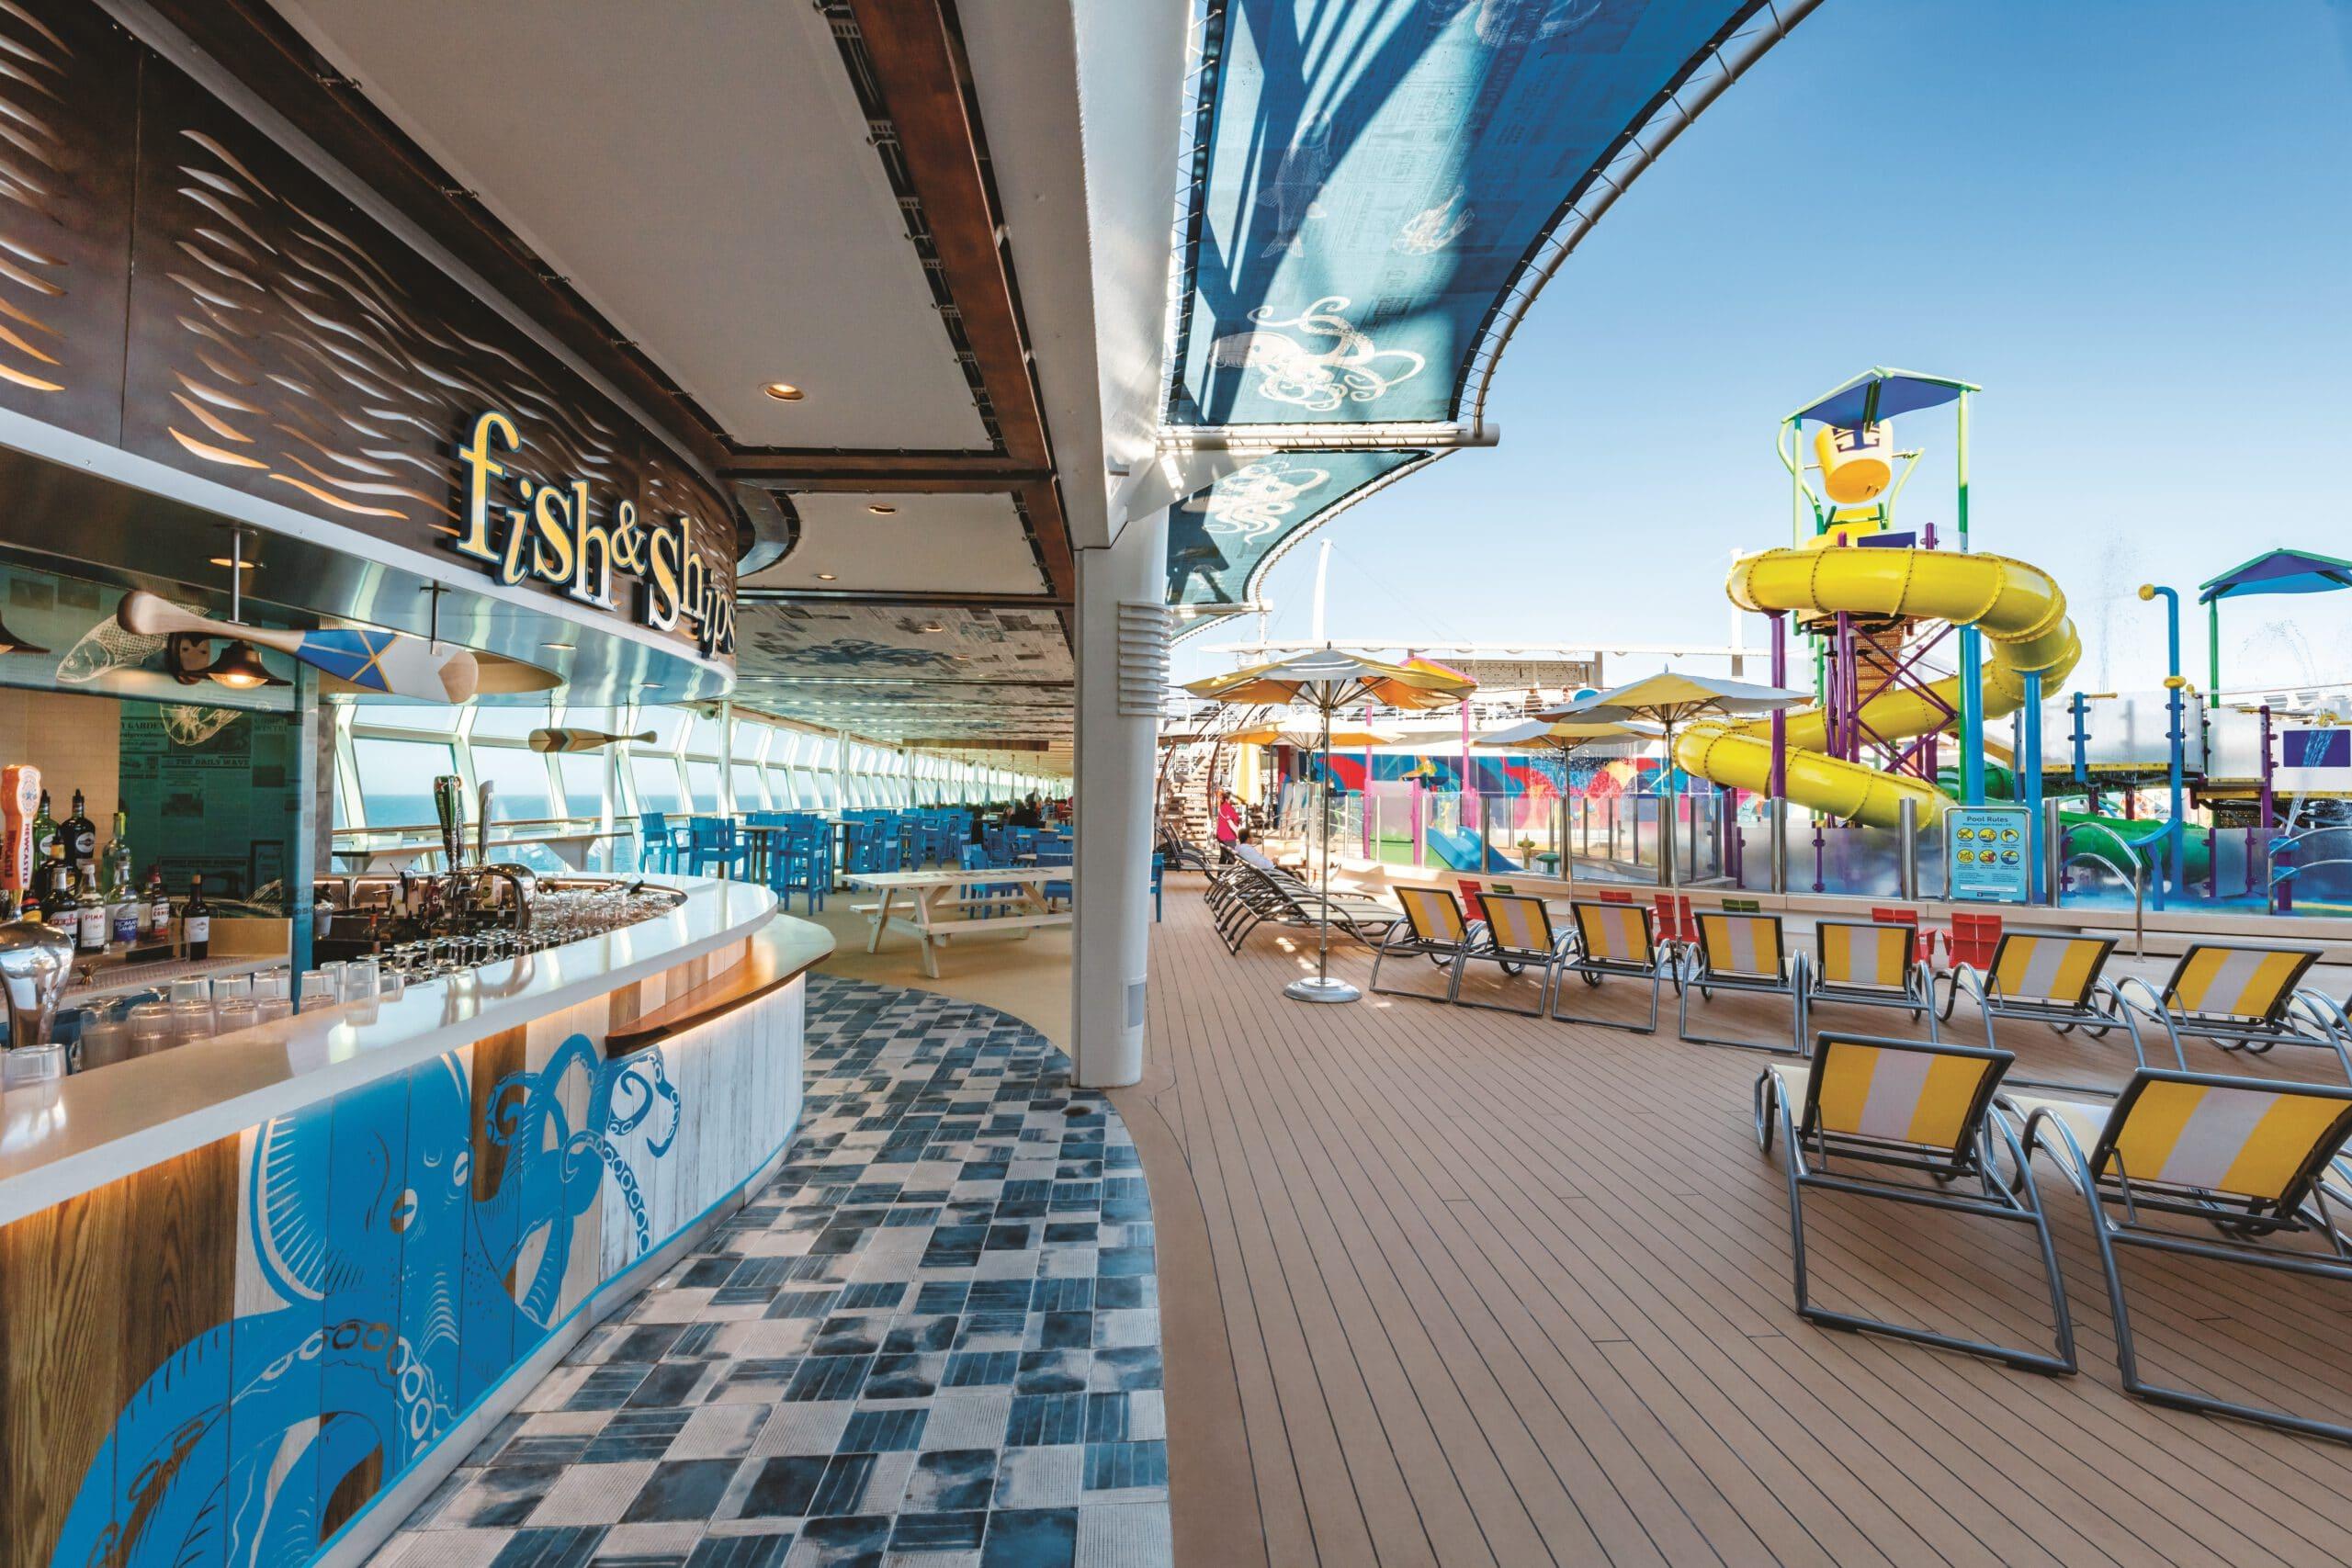 Cruiseschip-Independence of the Seas-Royal Caribbean International-Fish&Ships/Pool Deck